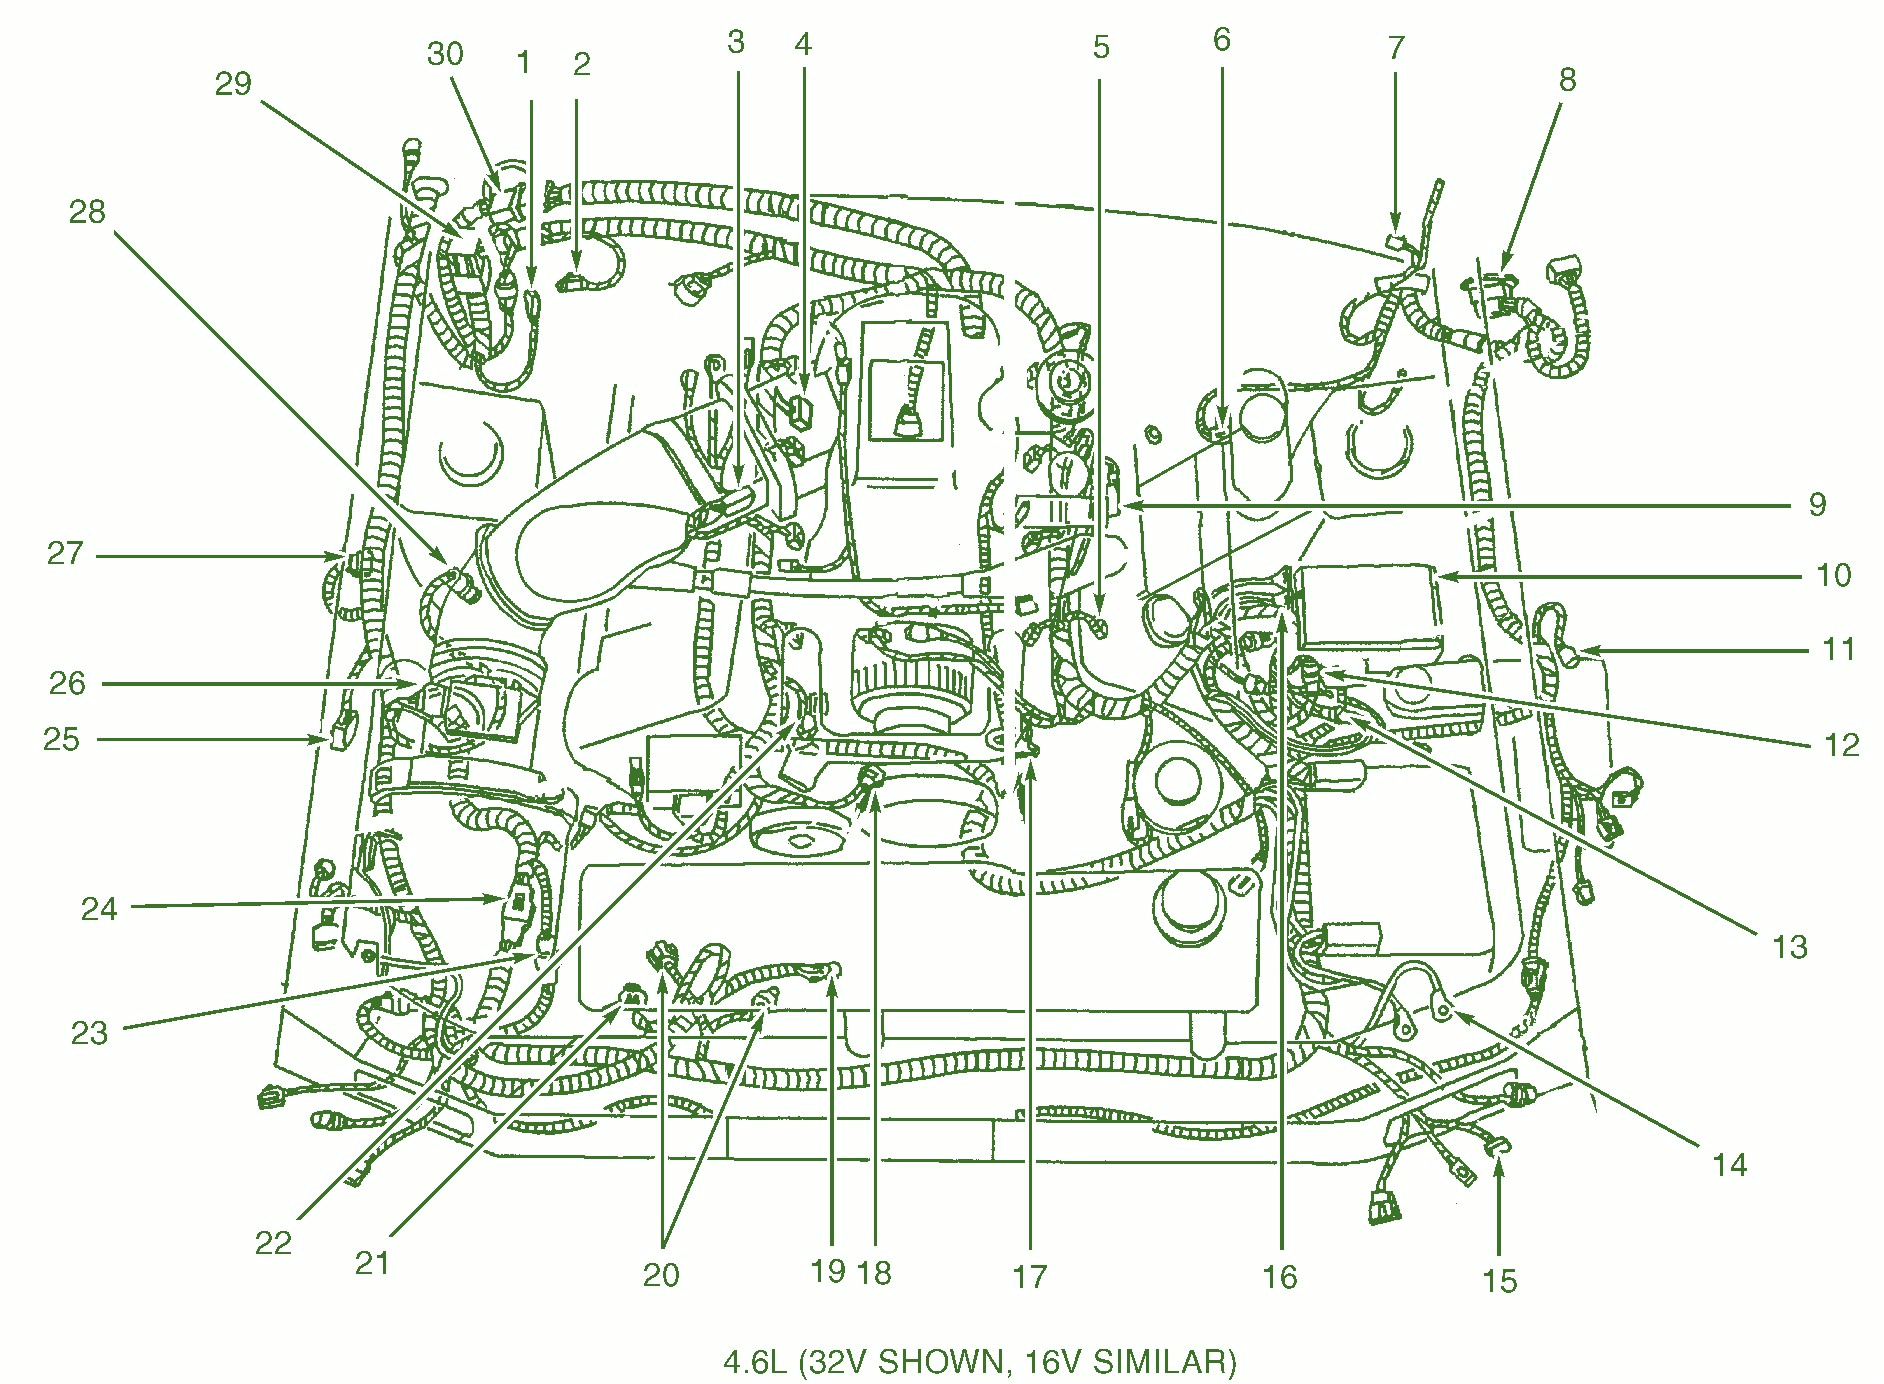 2000 mustang gt wiring wiring diagram expert 2000 mustang wiring schematic